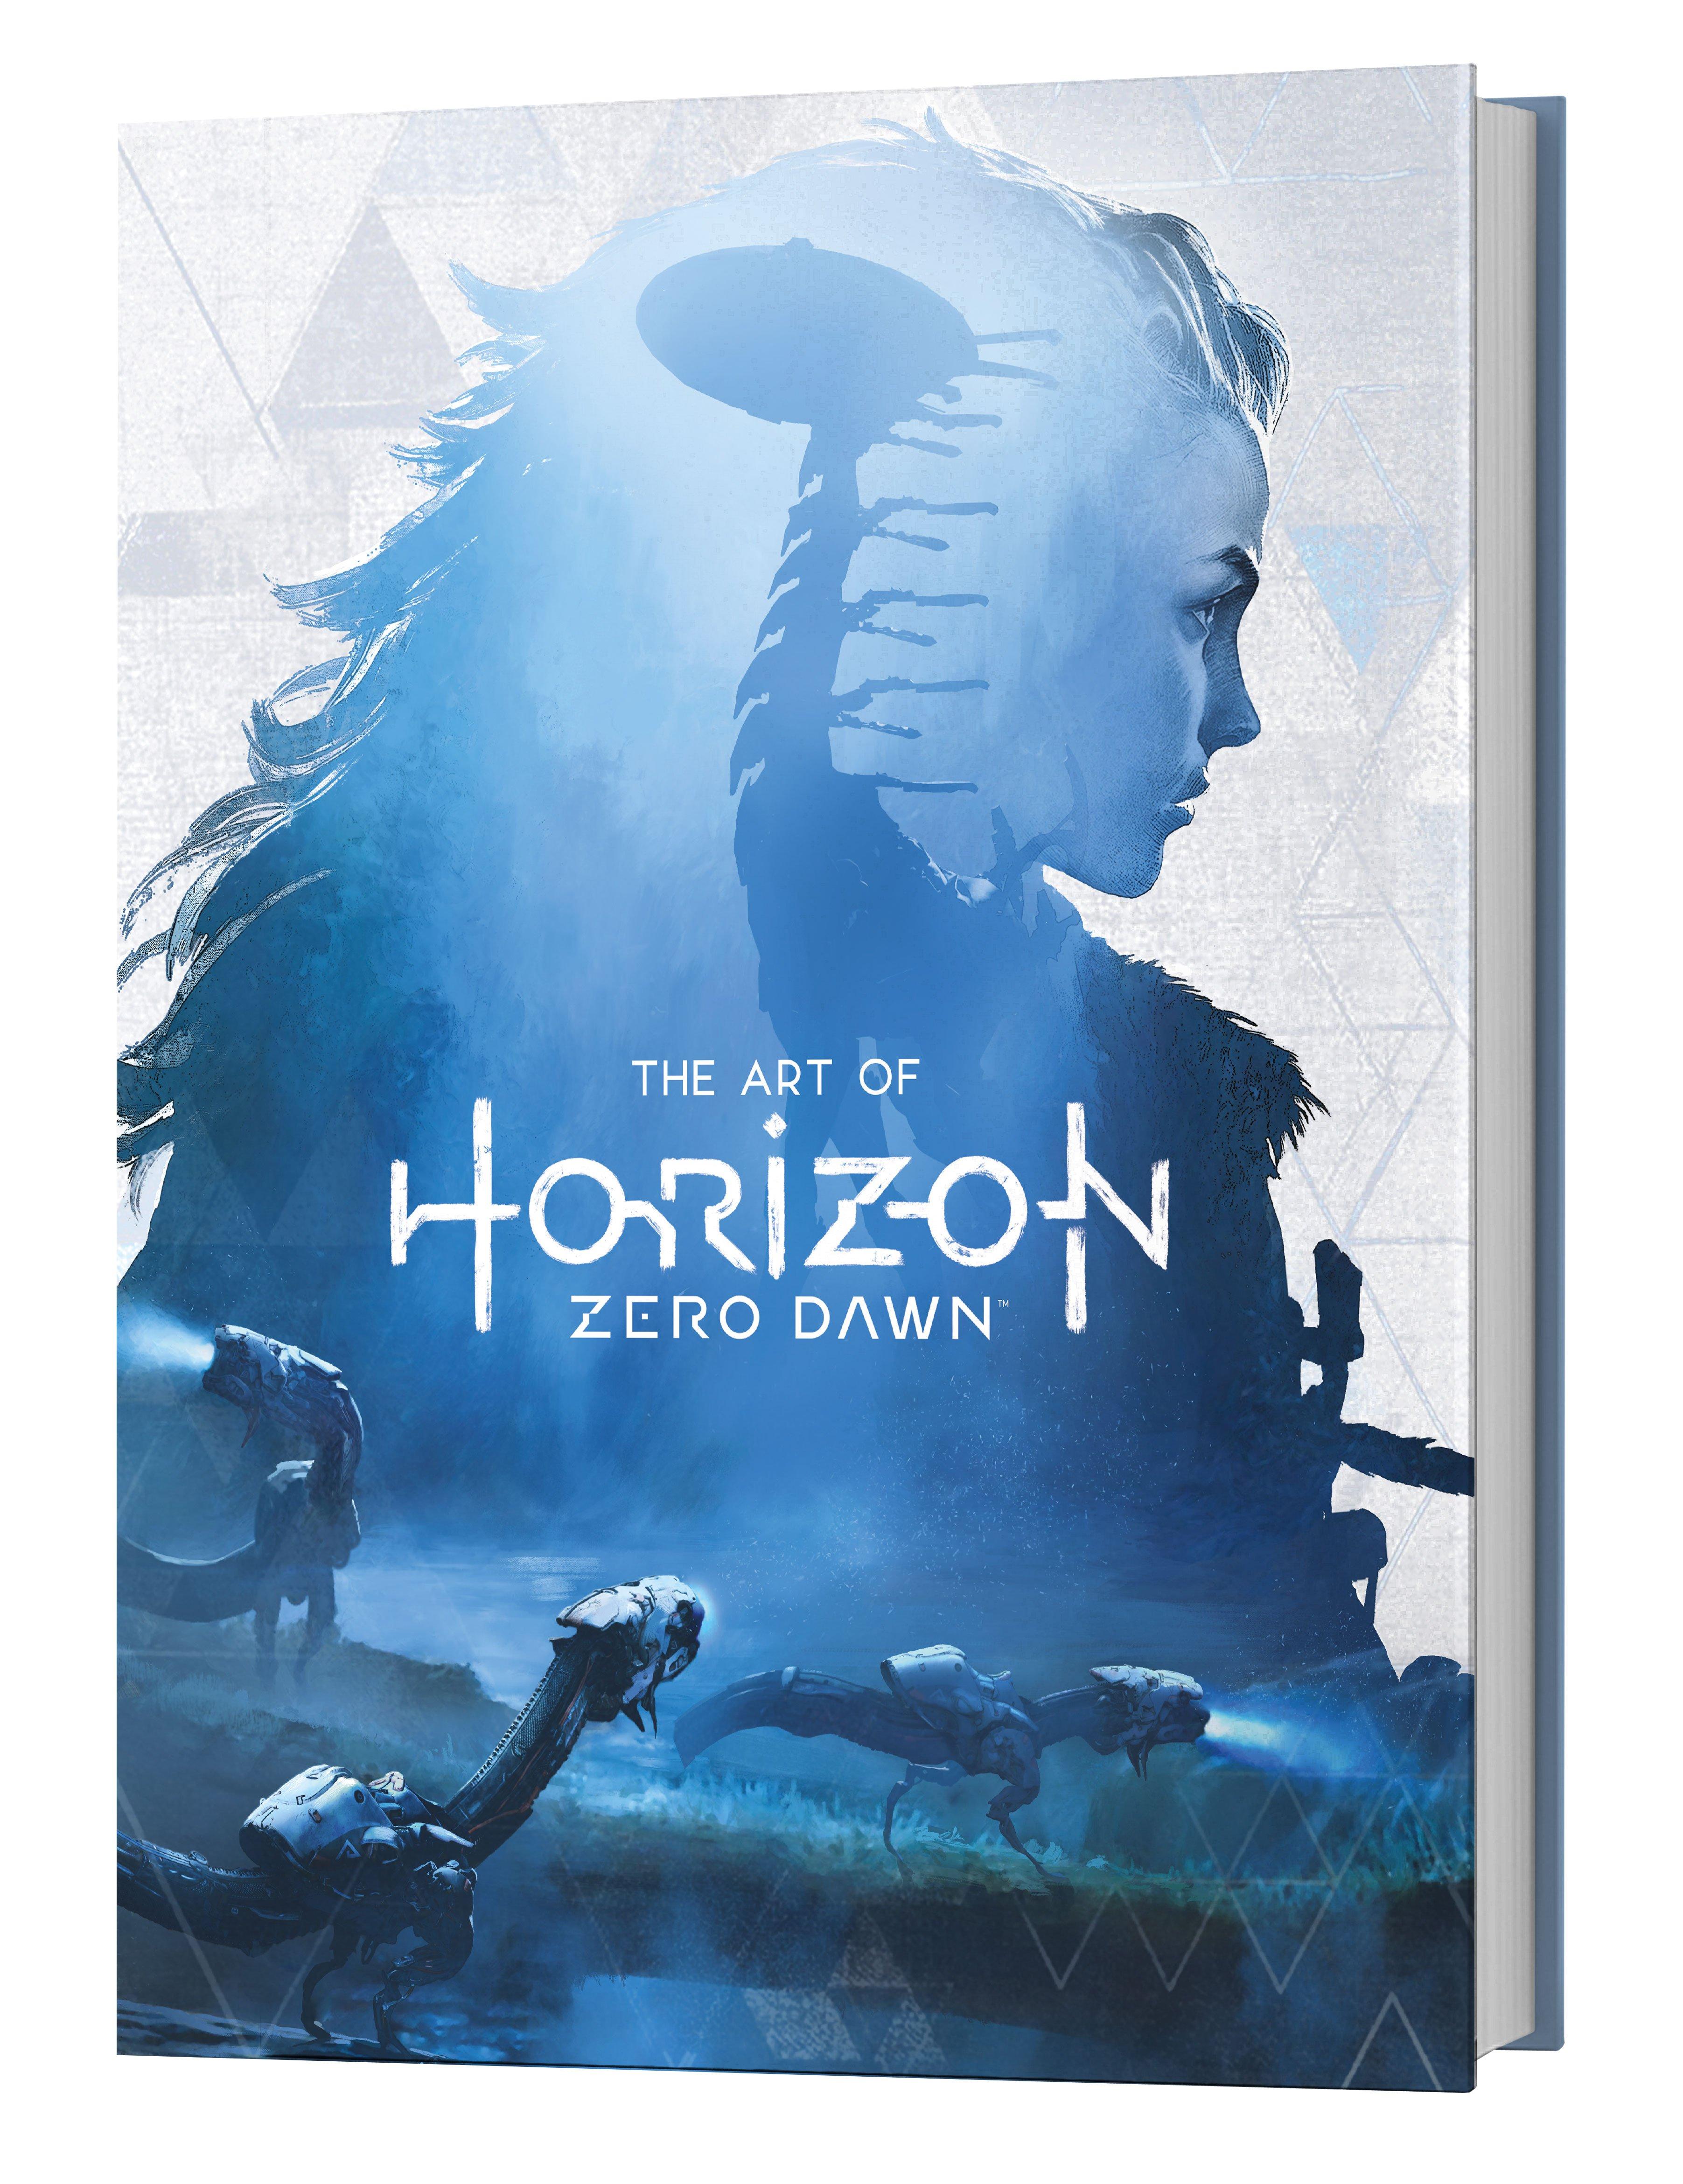 Horizon-ZeroDawn PS4 Div 030